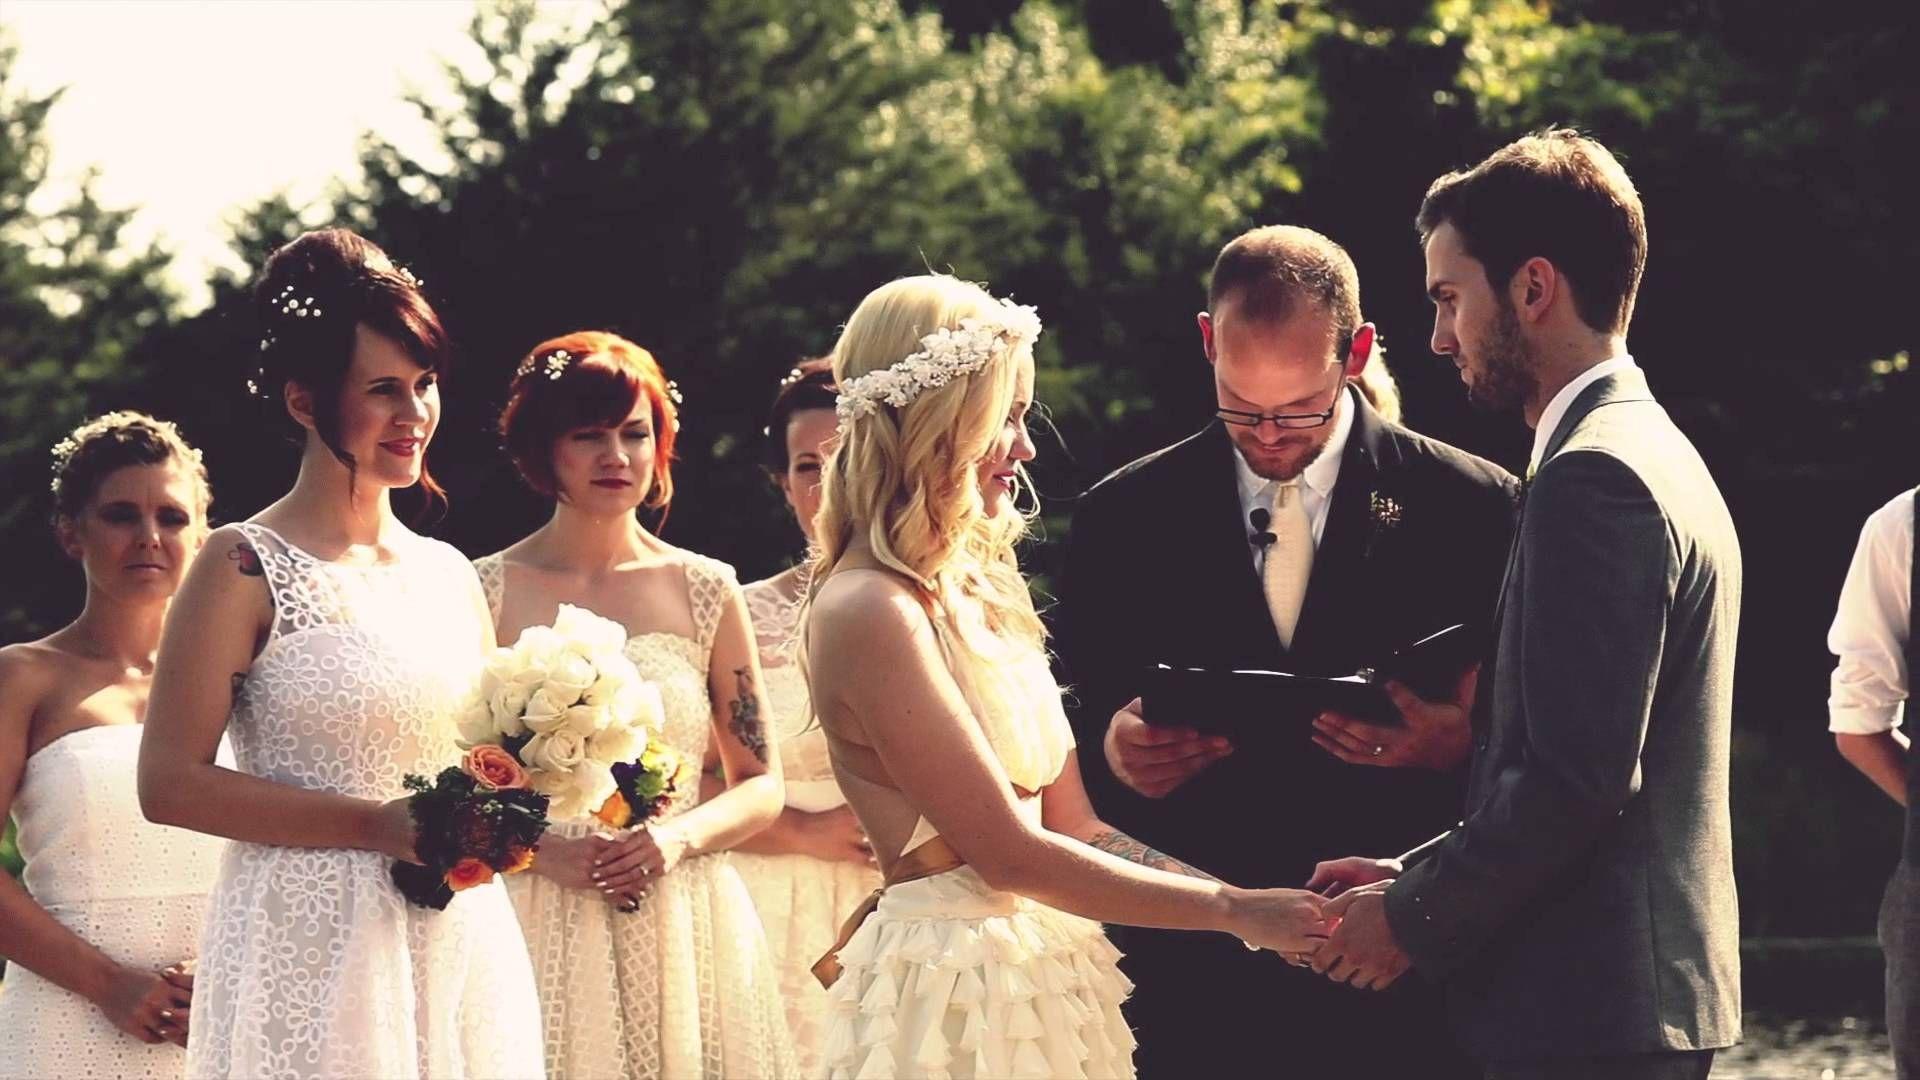 Emma Trey Wedding Video Angie Hilton Laura Hilton Looks Like Something You May Like Wedding Video Wedding Videos Wedding Video Inspiration